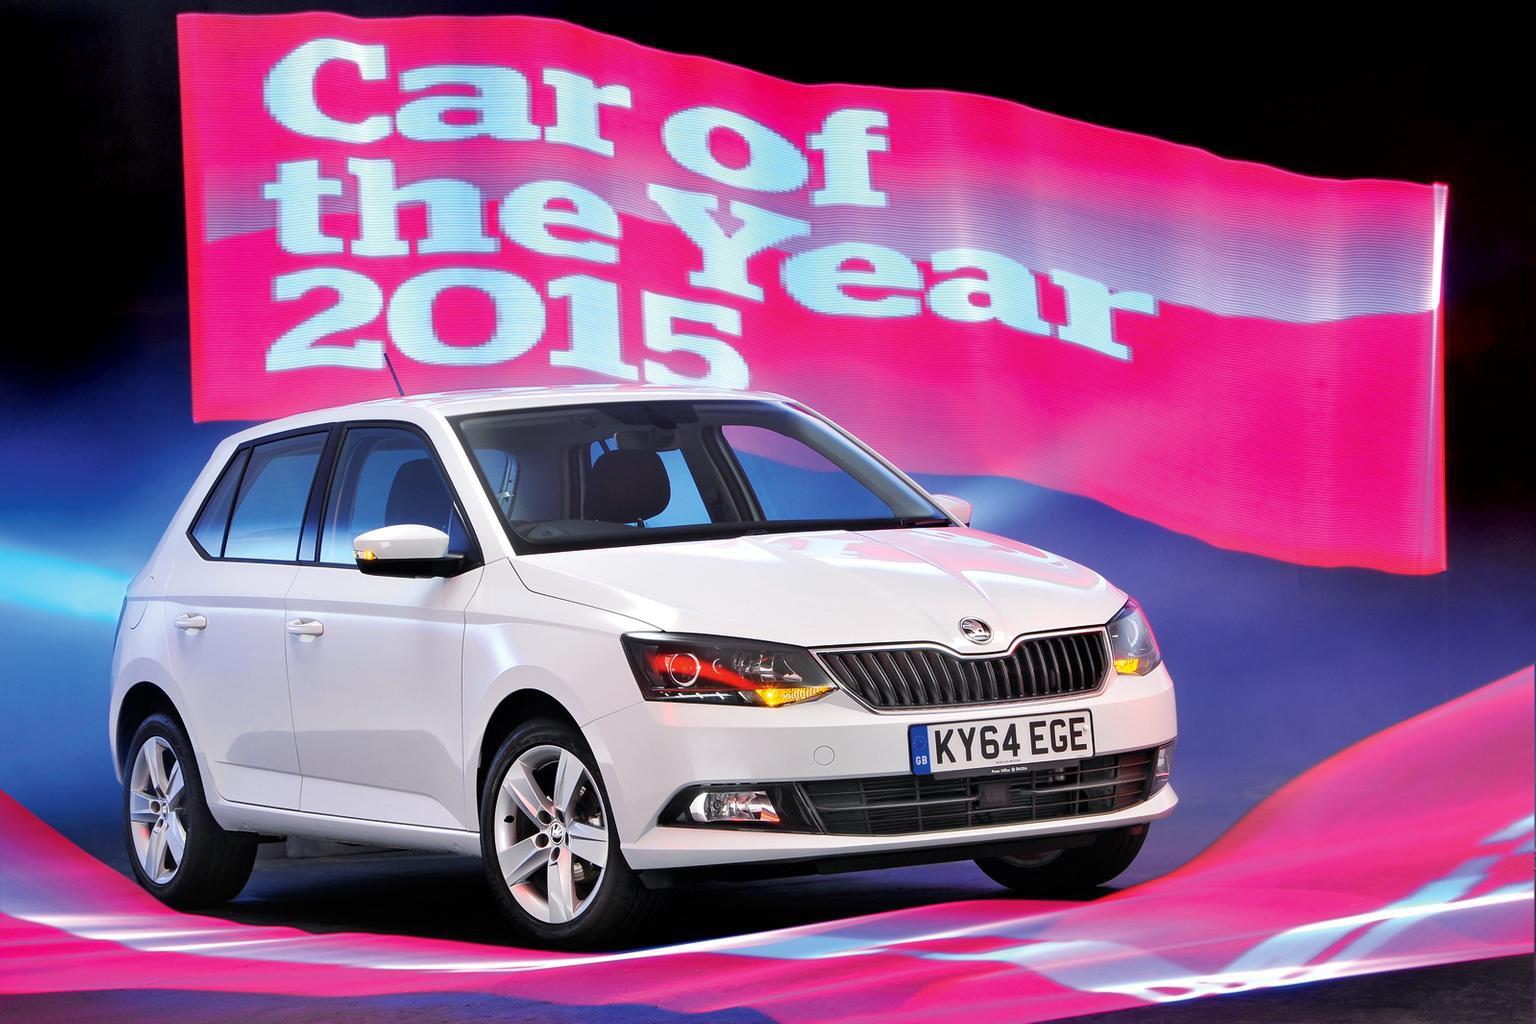 Skoda Fabia is 2015 What Car? Car of the Year